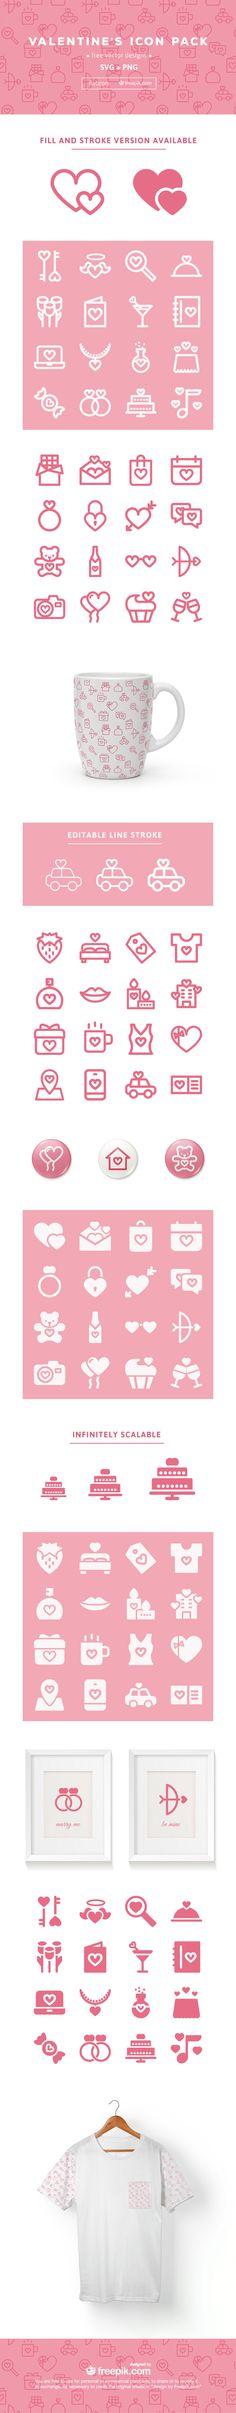 Cover-valentine-icons-rgb